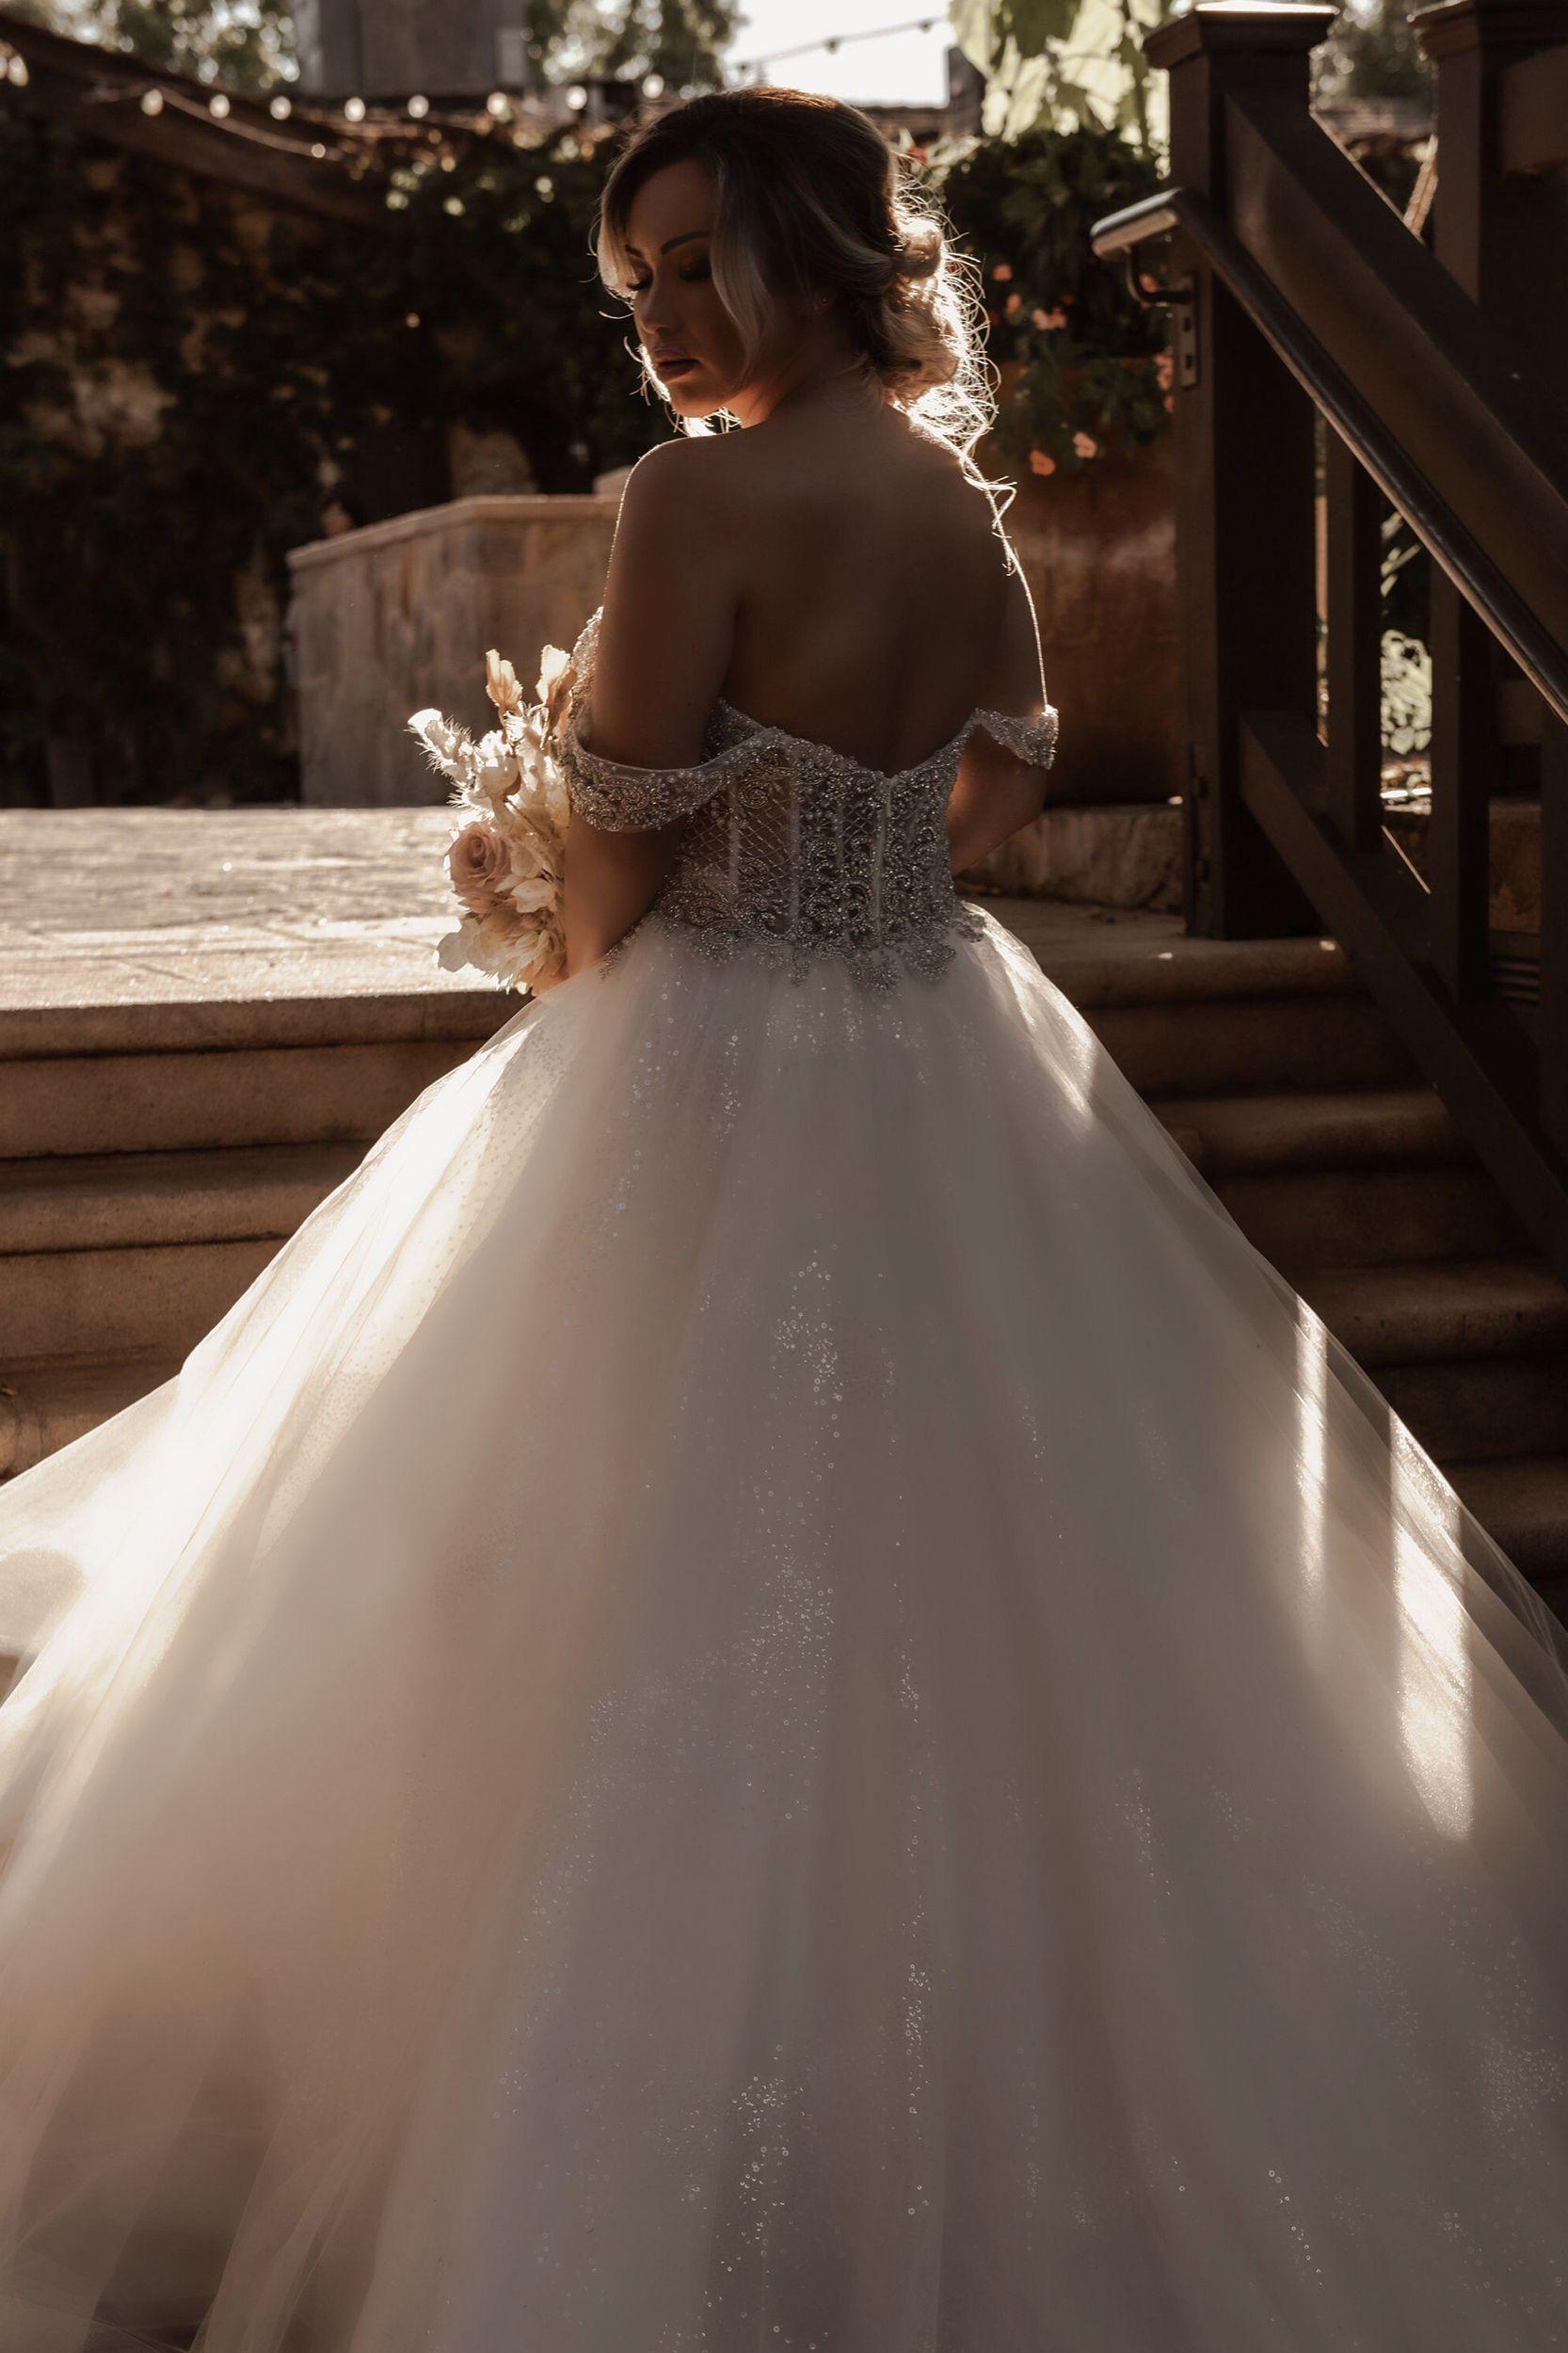 Sparkling Ballgown Wedding Dress by Casablanca Bridal